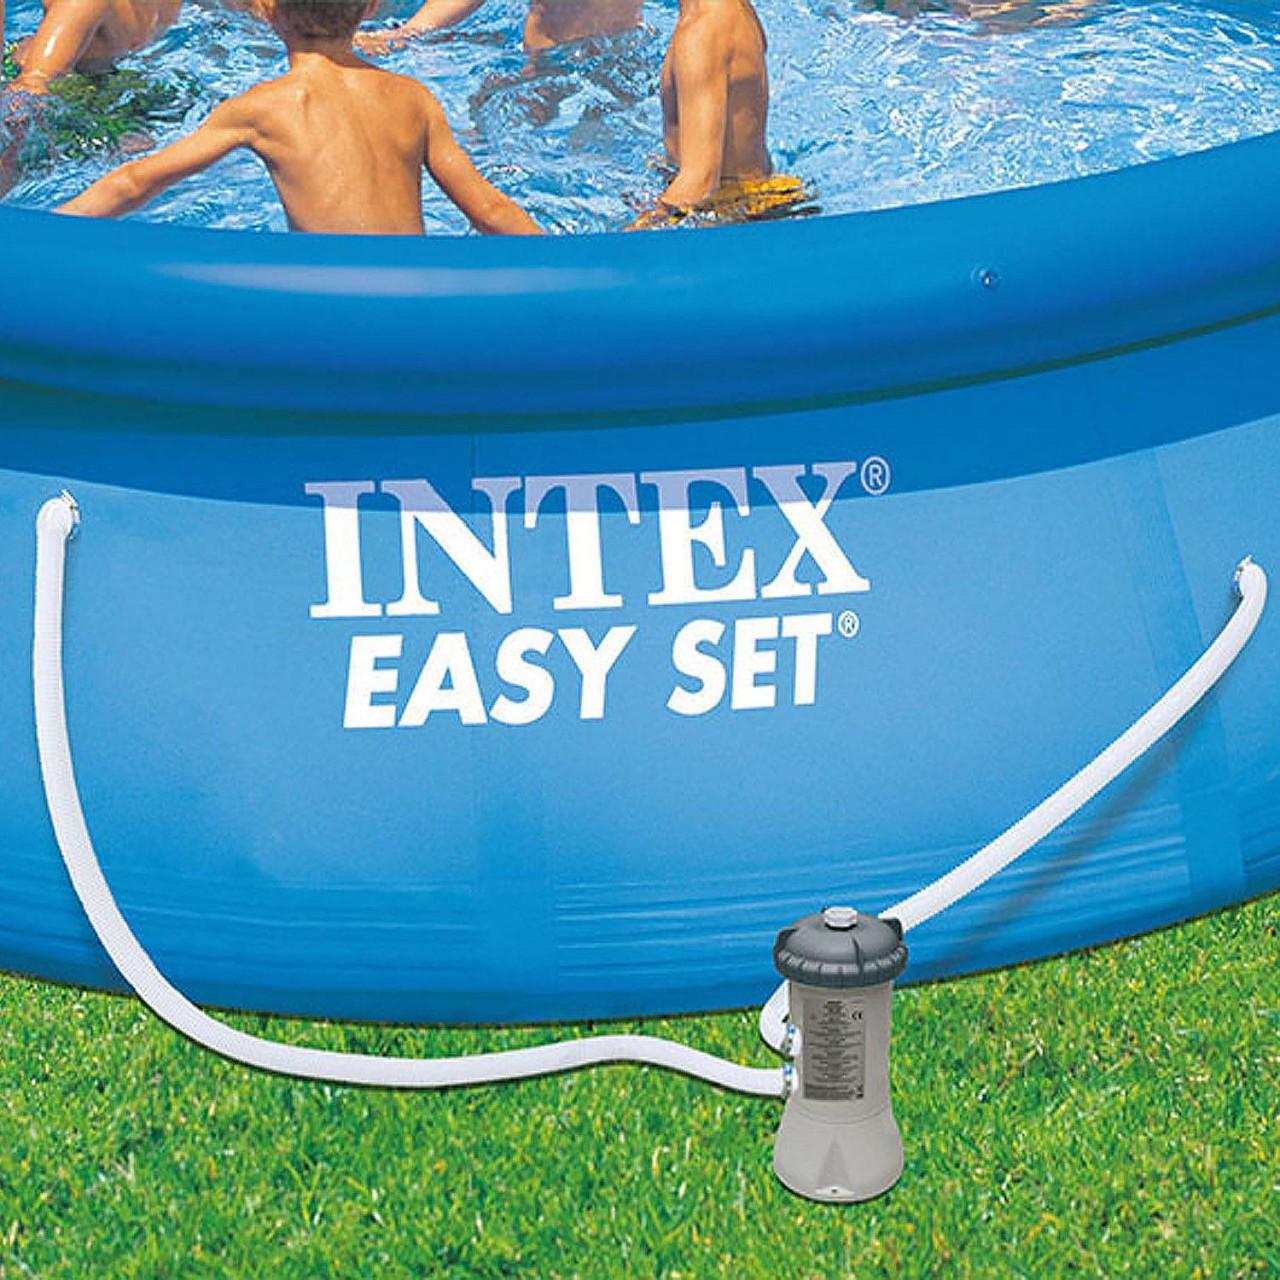 Intex Poolschlauch Ø32mm 1,5m lang Schlauch Pumpe Pool Schwimmbadschlauch 29059